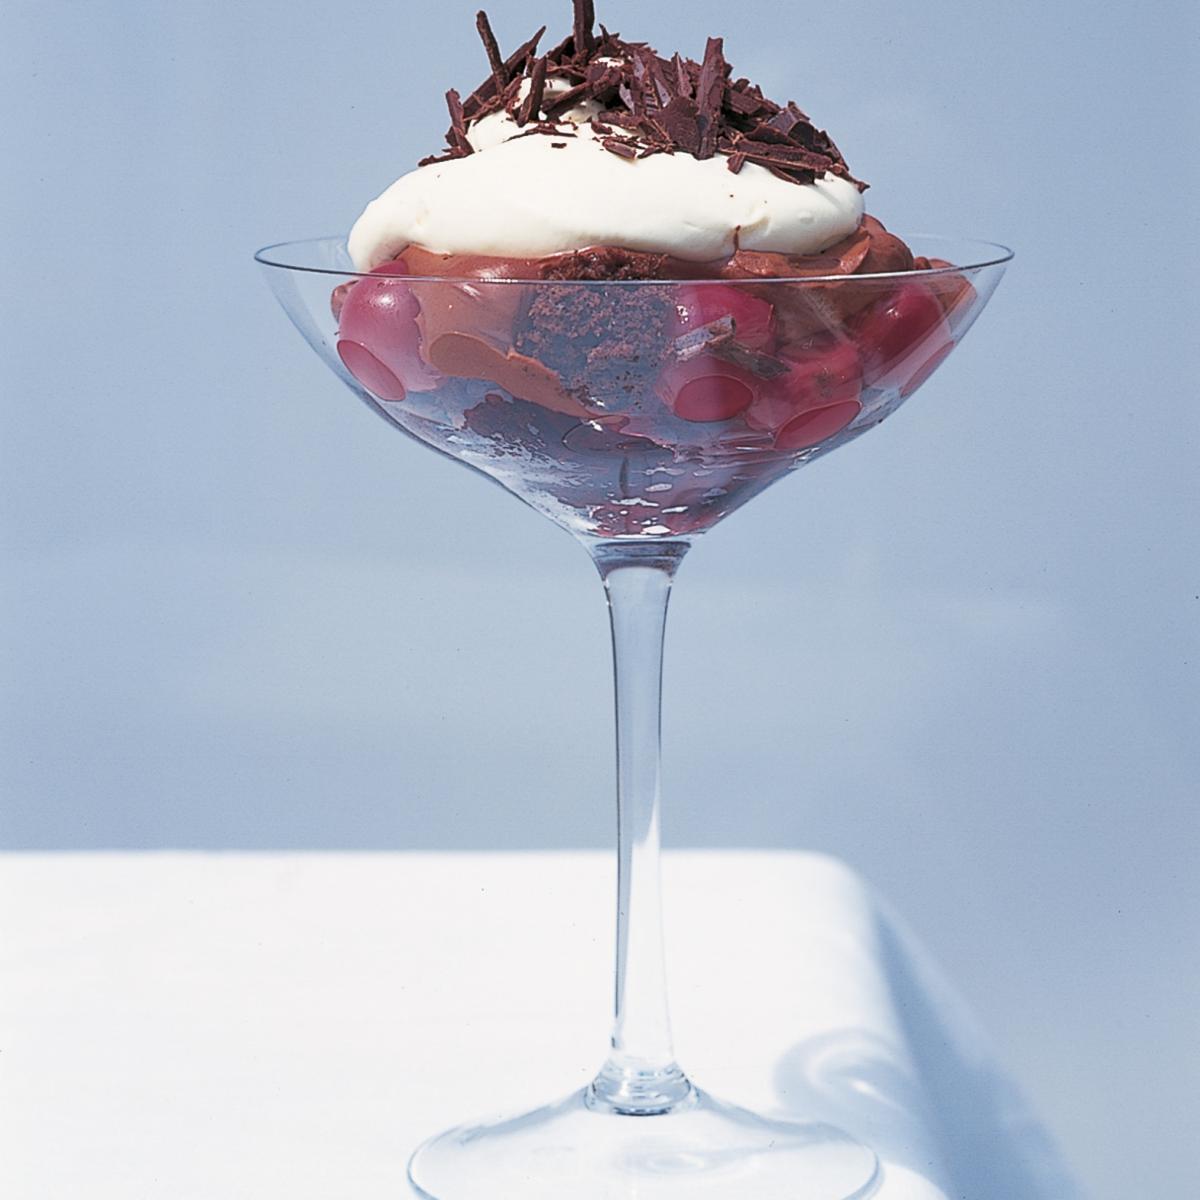 A picture of Delia's Cheats' Chocolate Trifle recipe